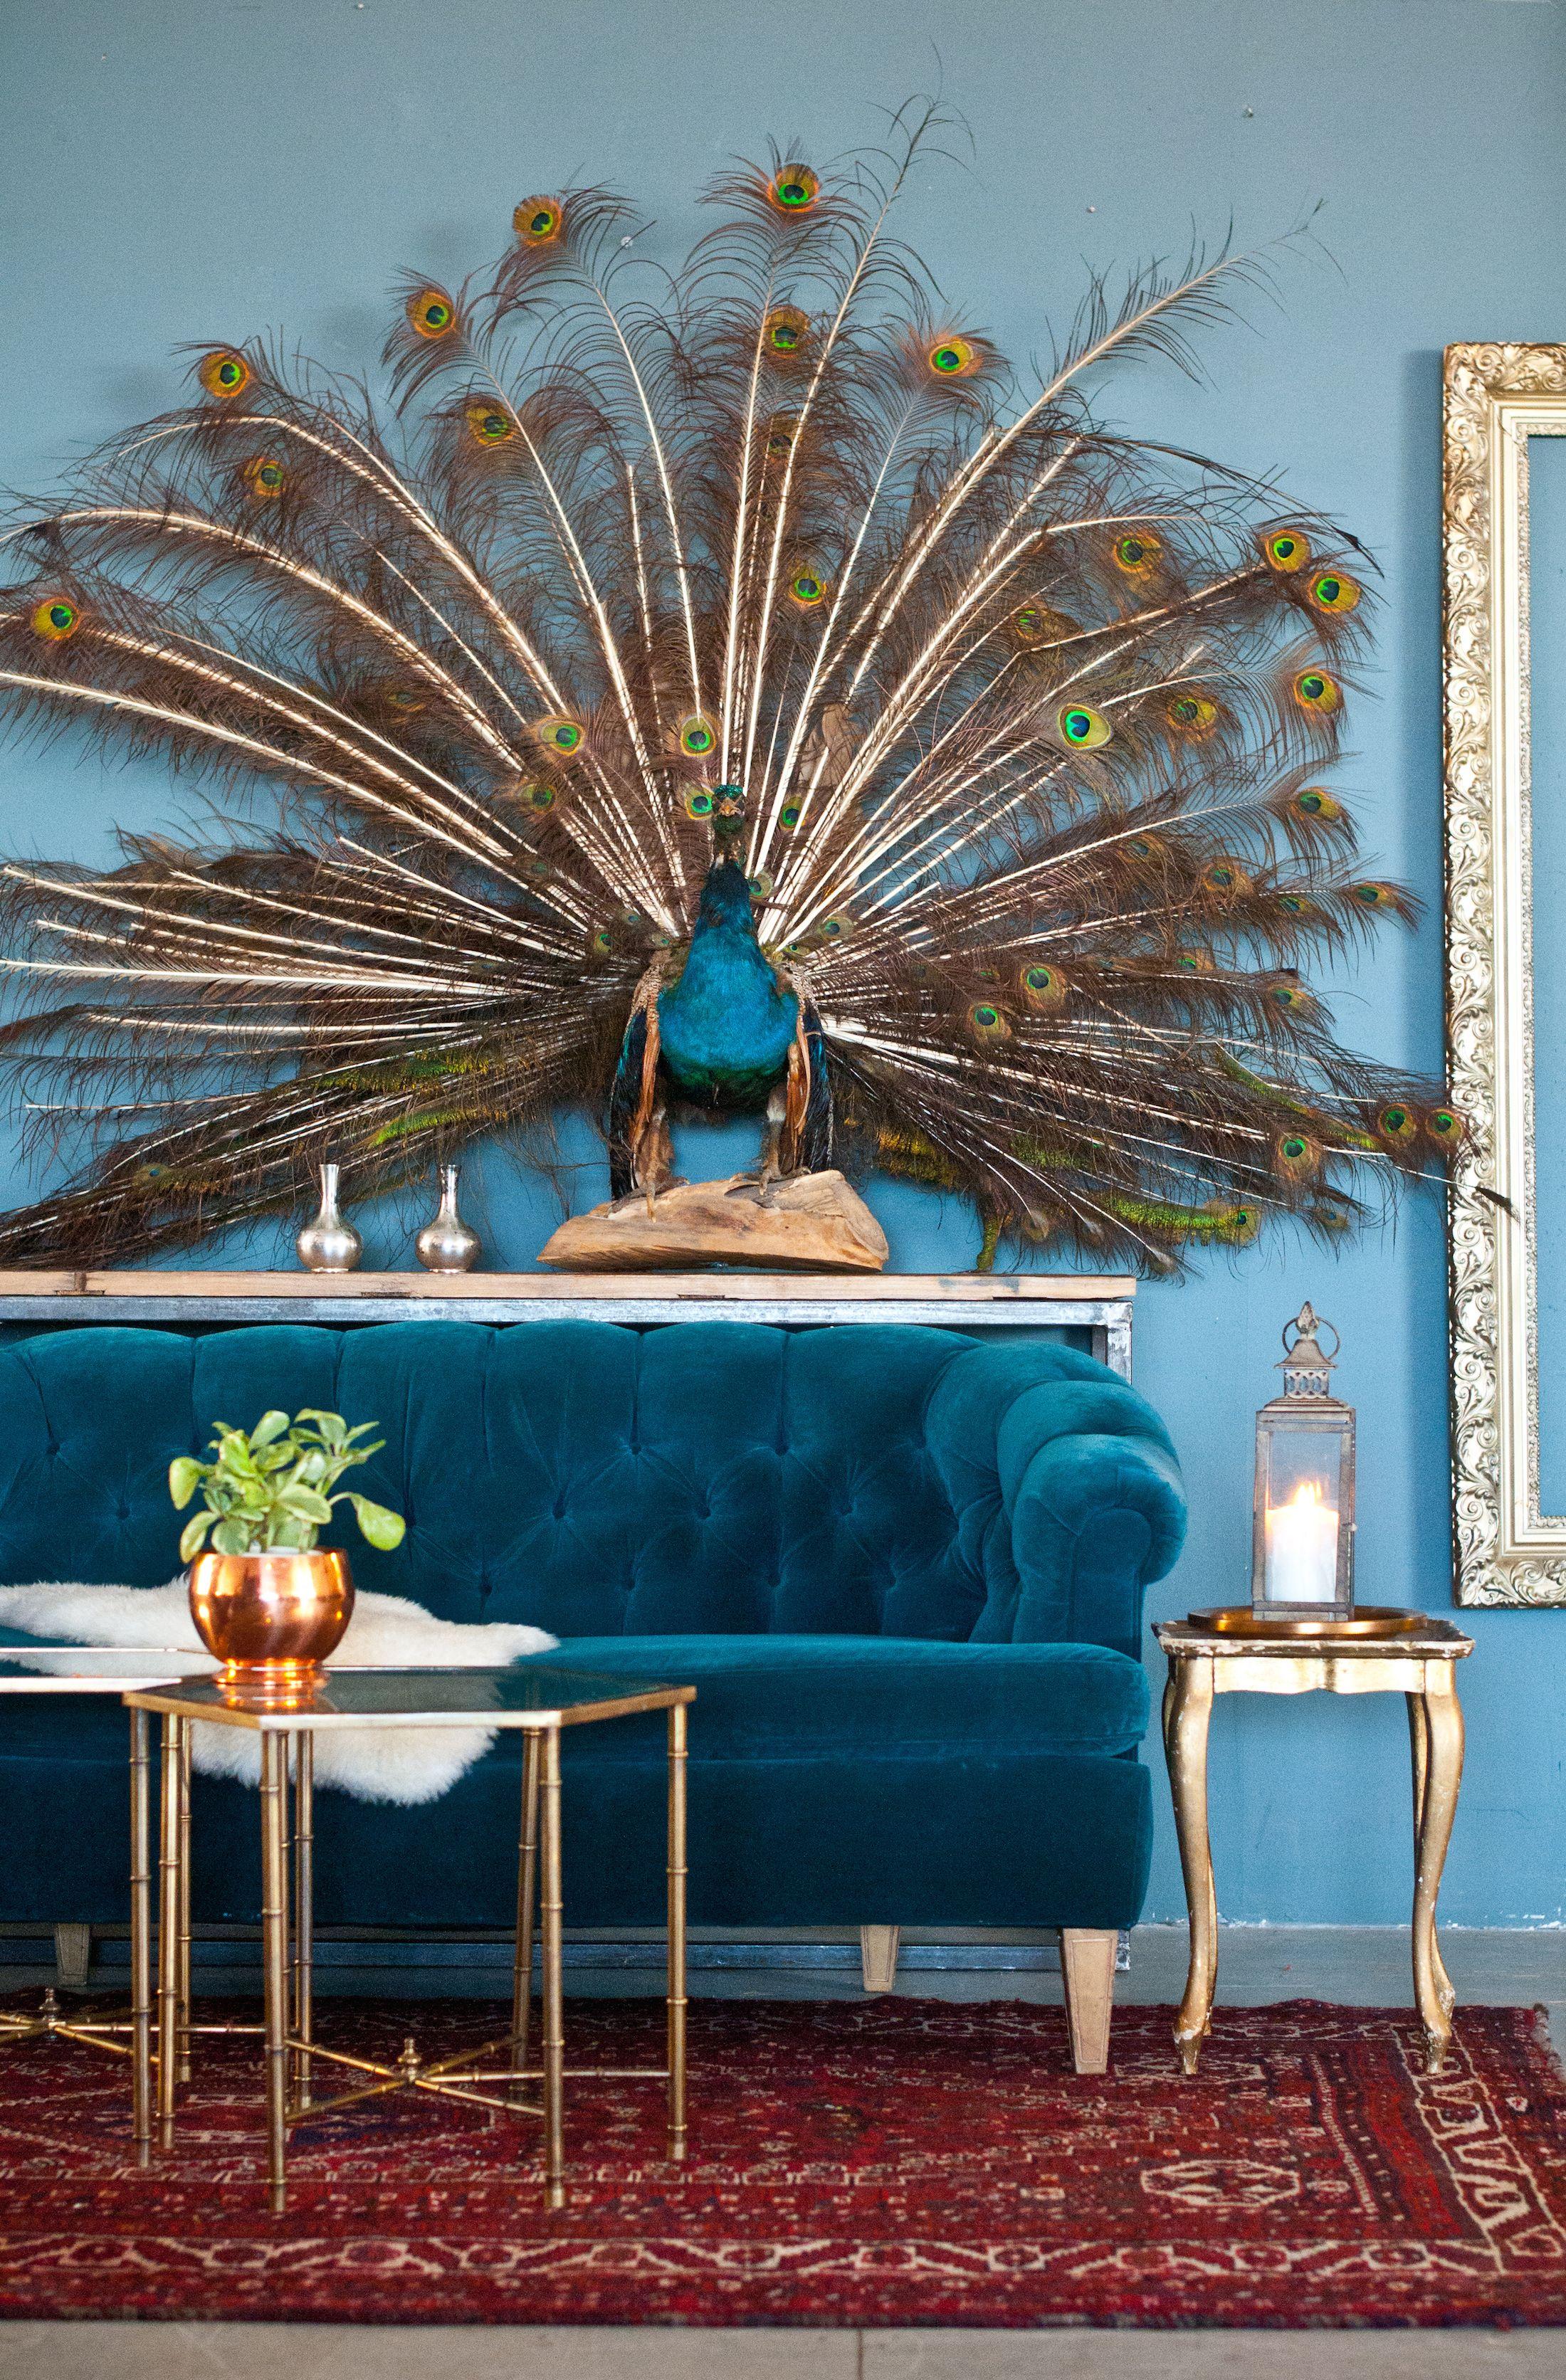 Pin On Strange Things That I Like #peacock #decor #living #room